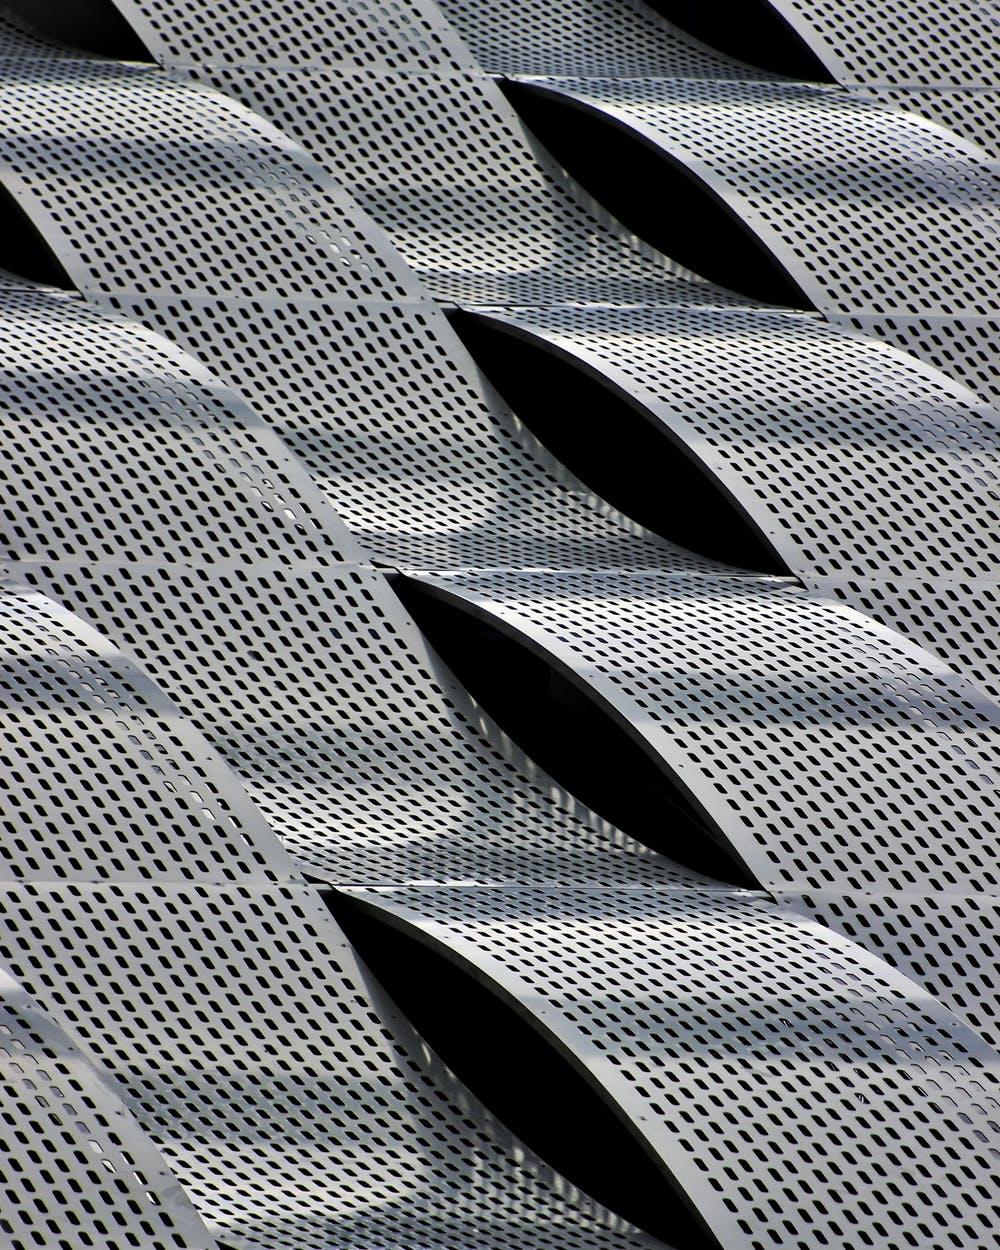 branko perforating in ohio, ohio metal services, perforating services